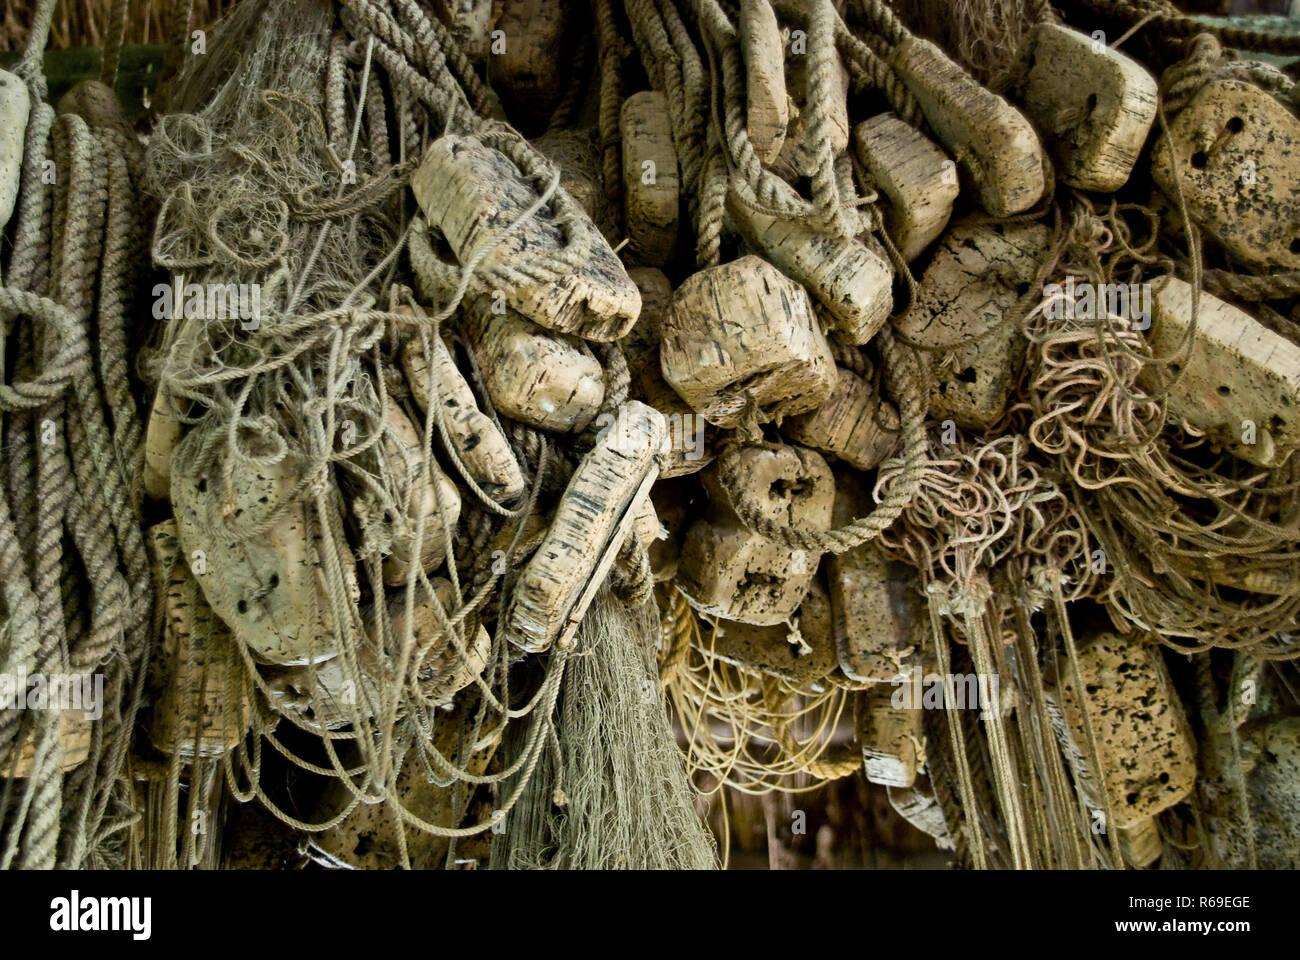 Fishing Nets - Stock Image